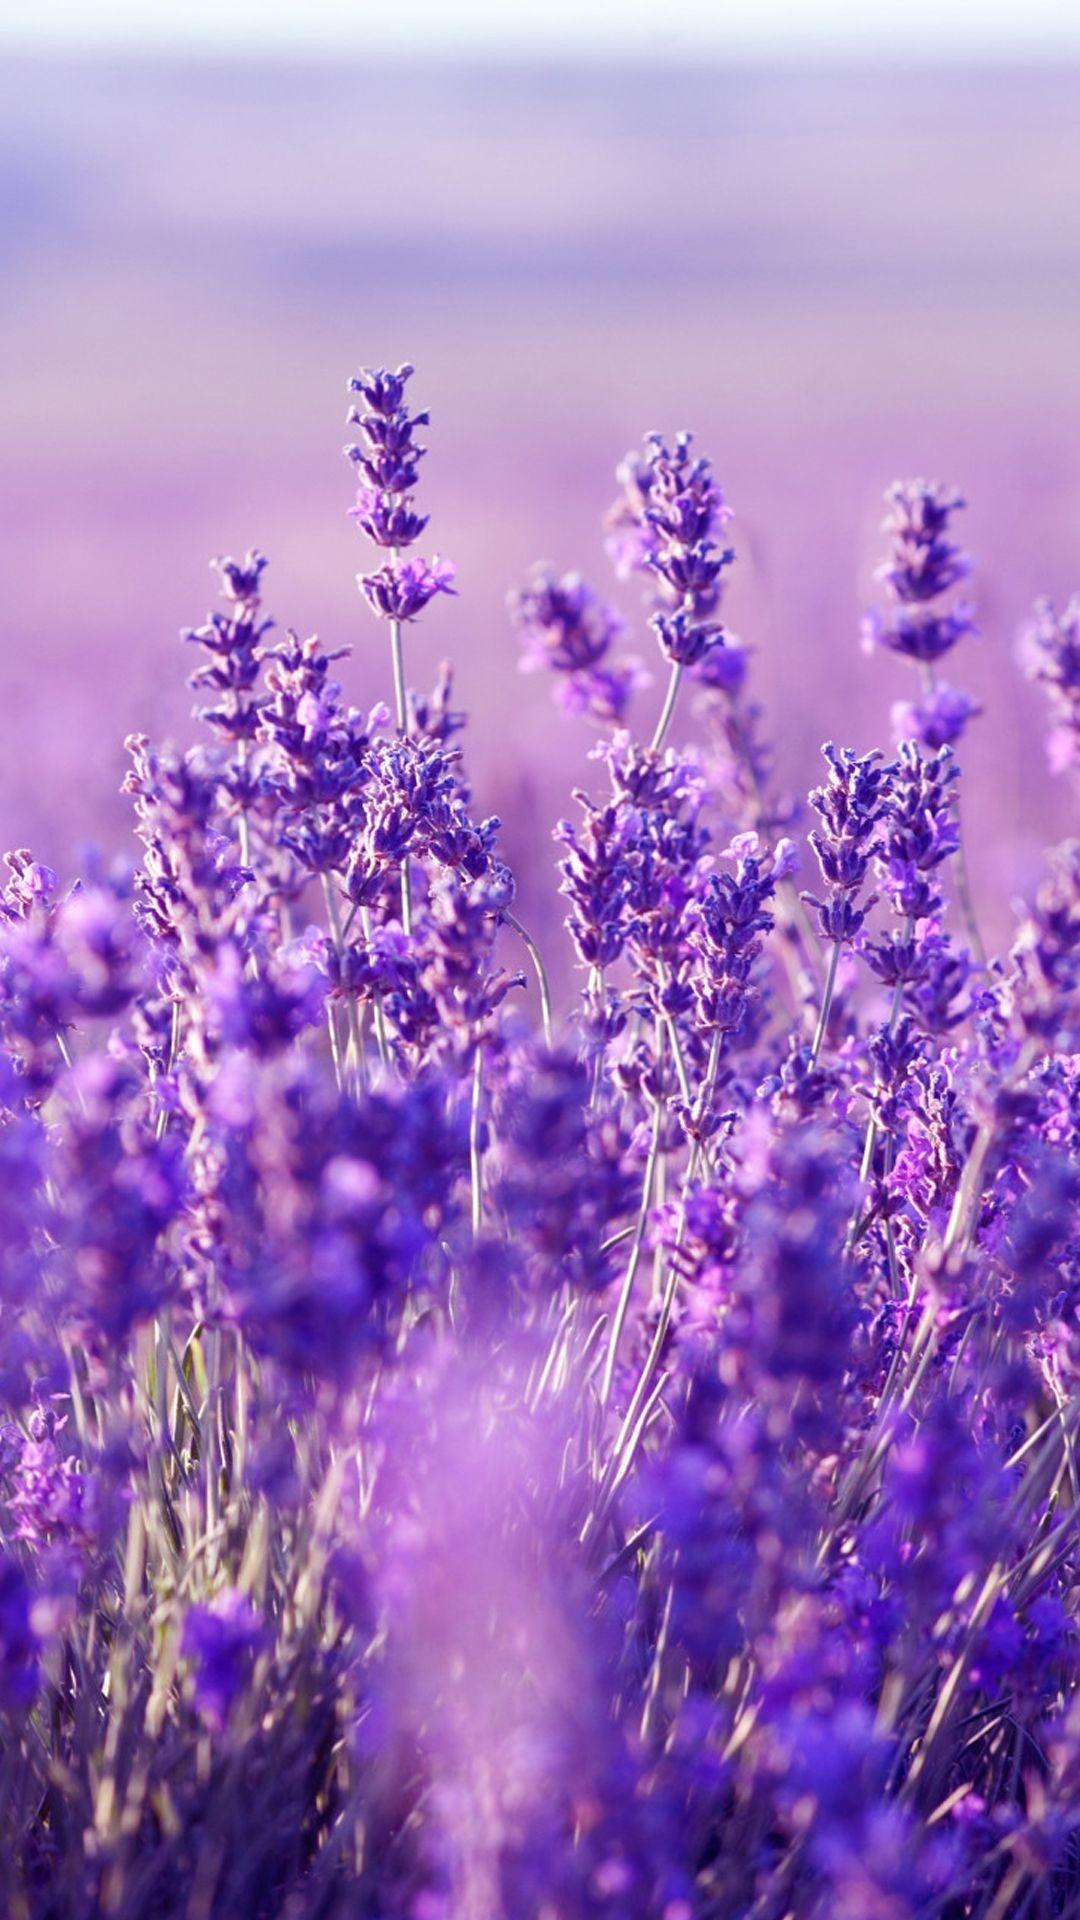 73 Lavender Flower Wallpapers On Wallpaperplay Purple Flowers Wallpaper Flower Aesthetic Purple Flowers